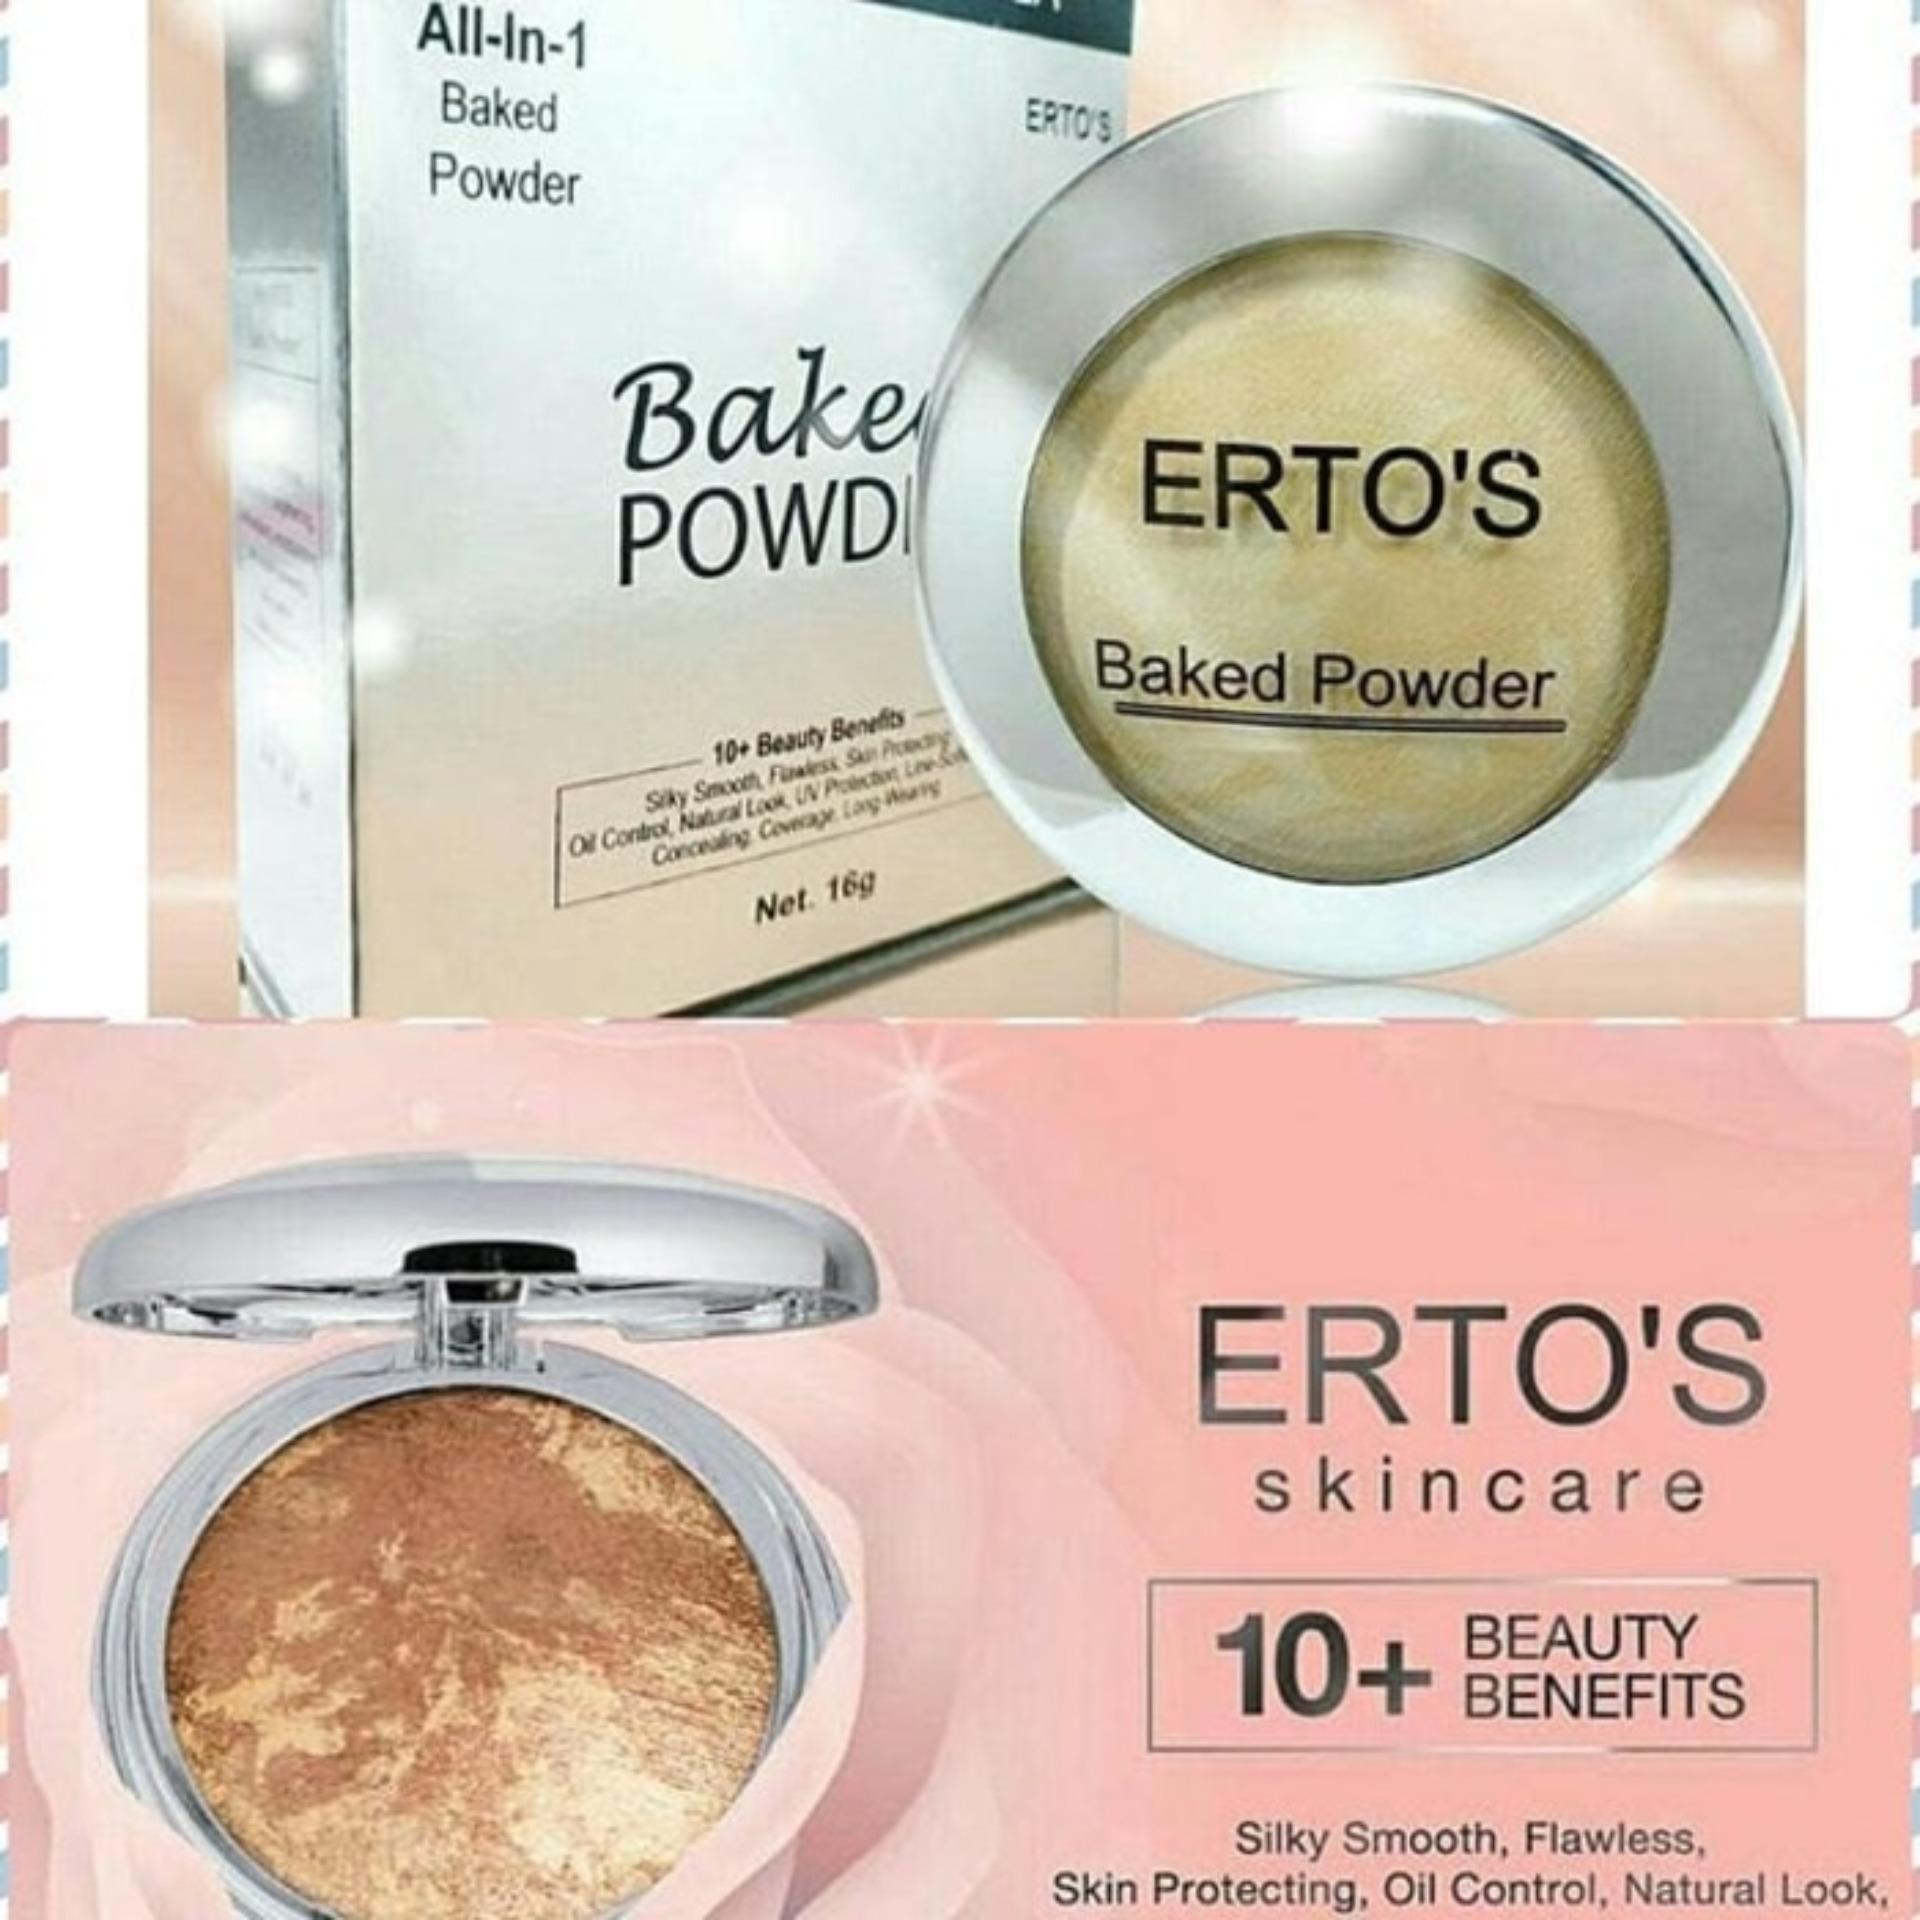 ERTOS Baked Powder all in 1 / Bedak Erto's